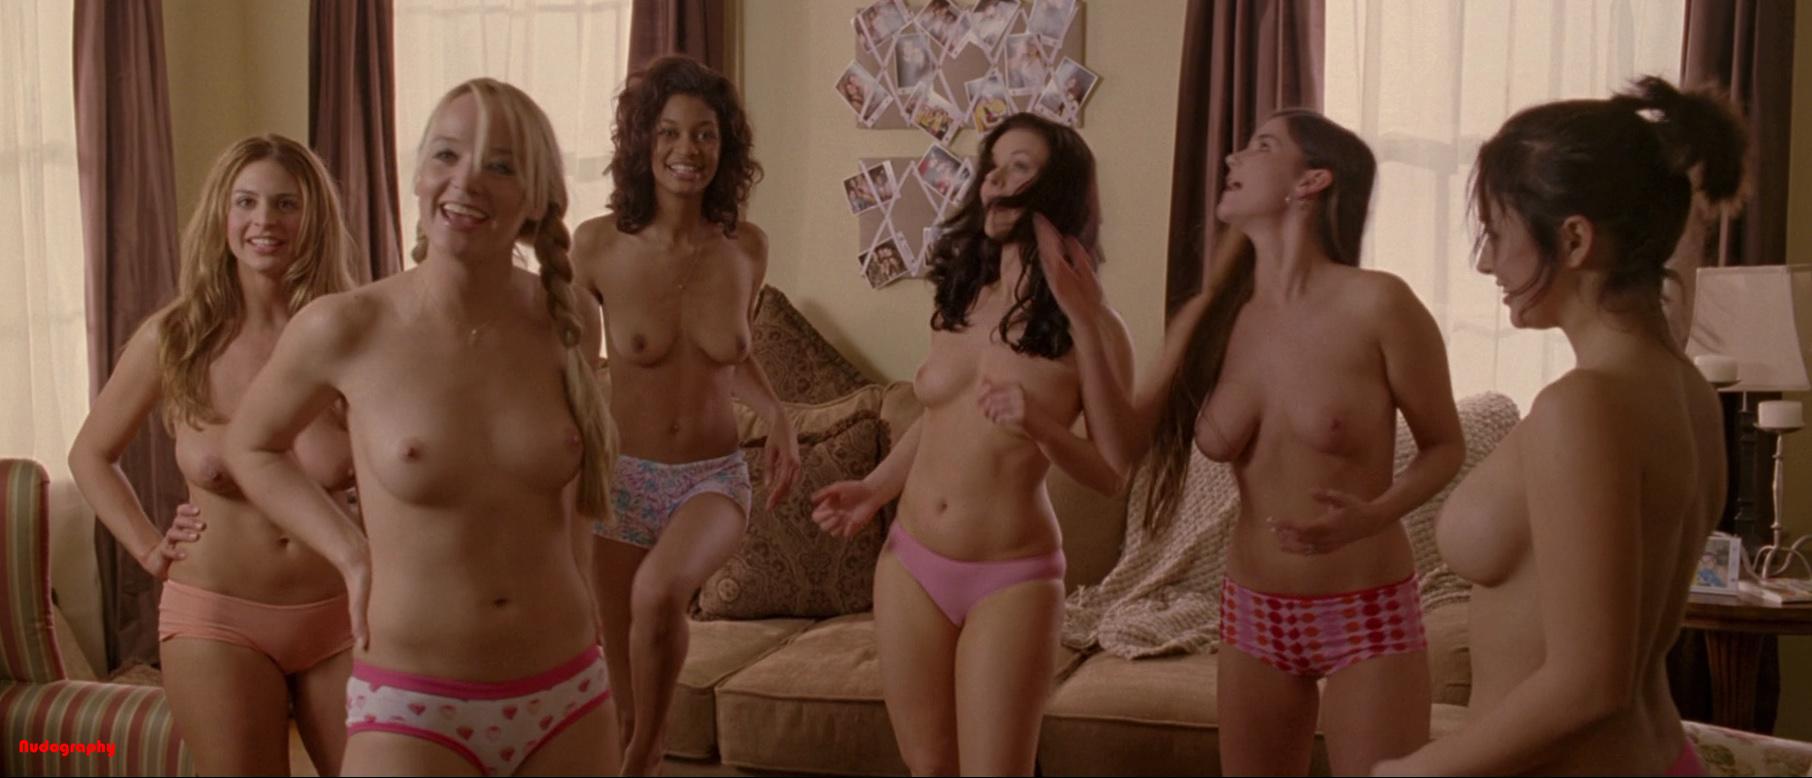 Stephanie mcmohan sex scene